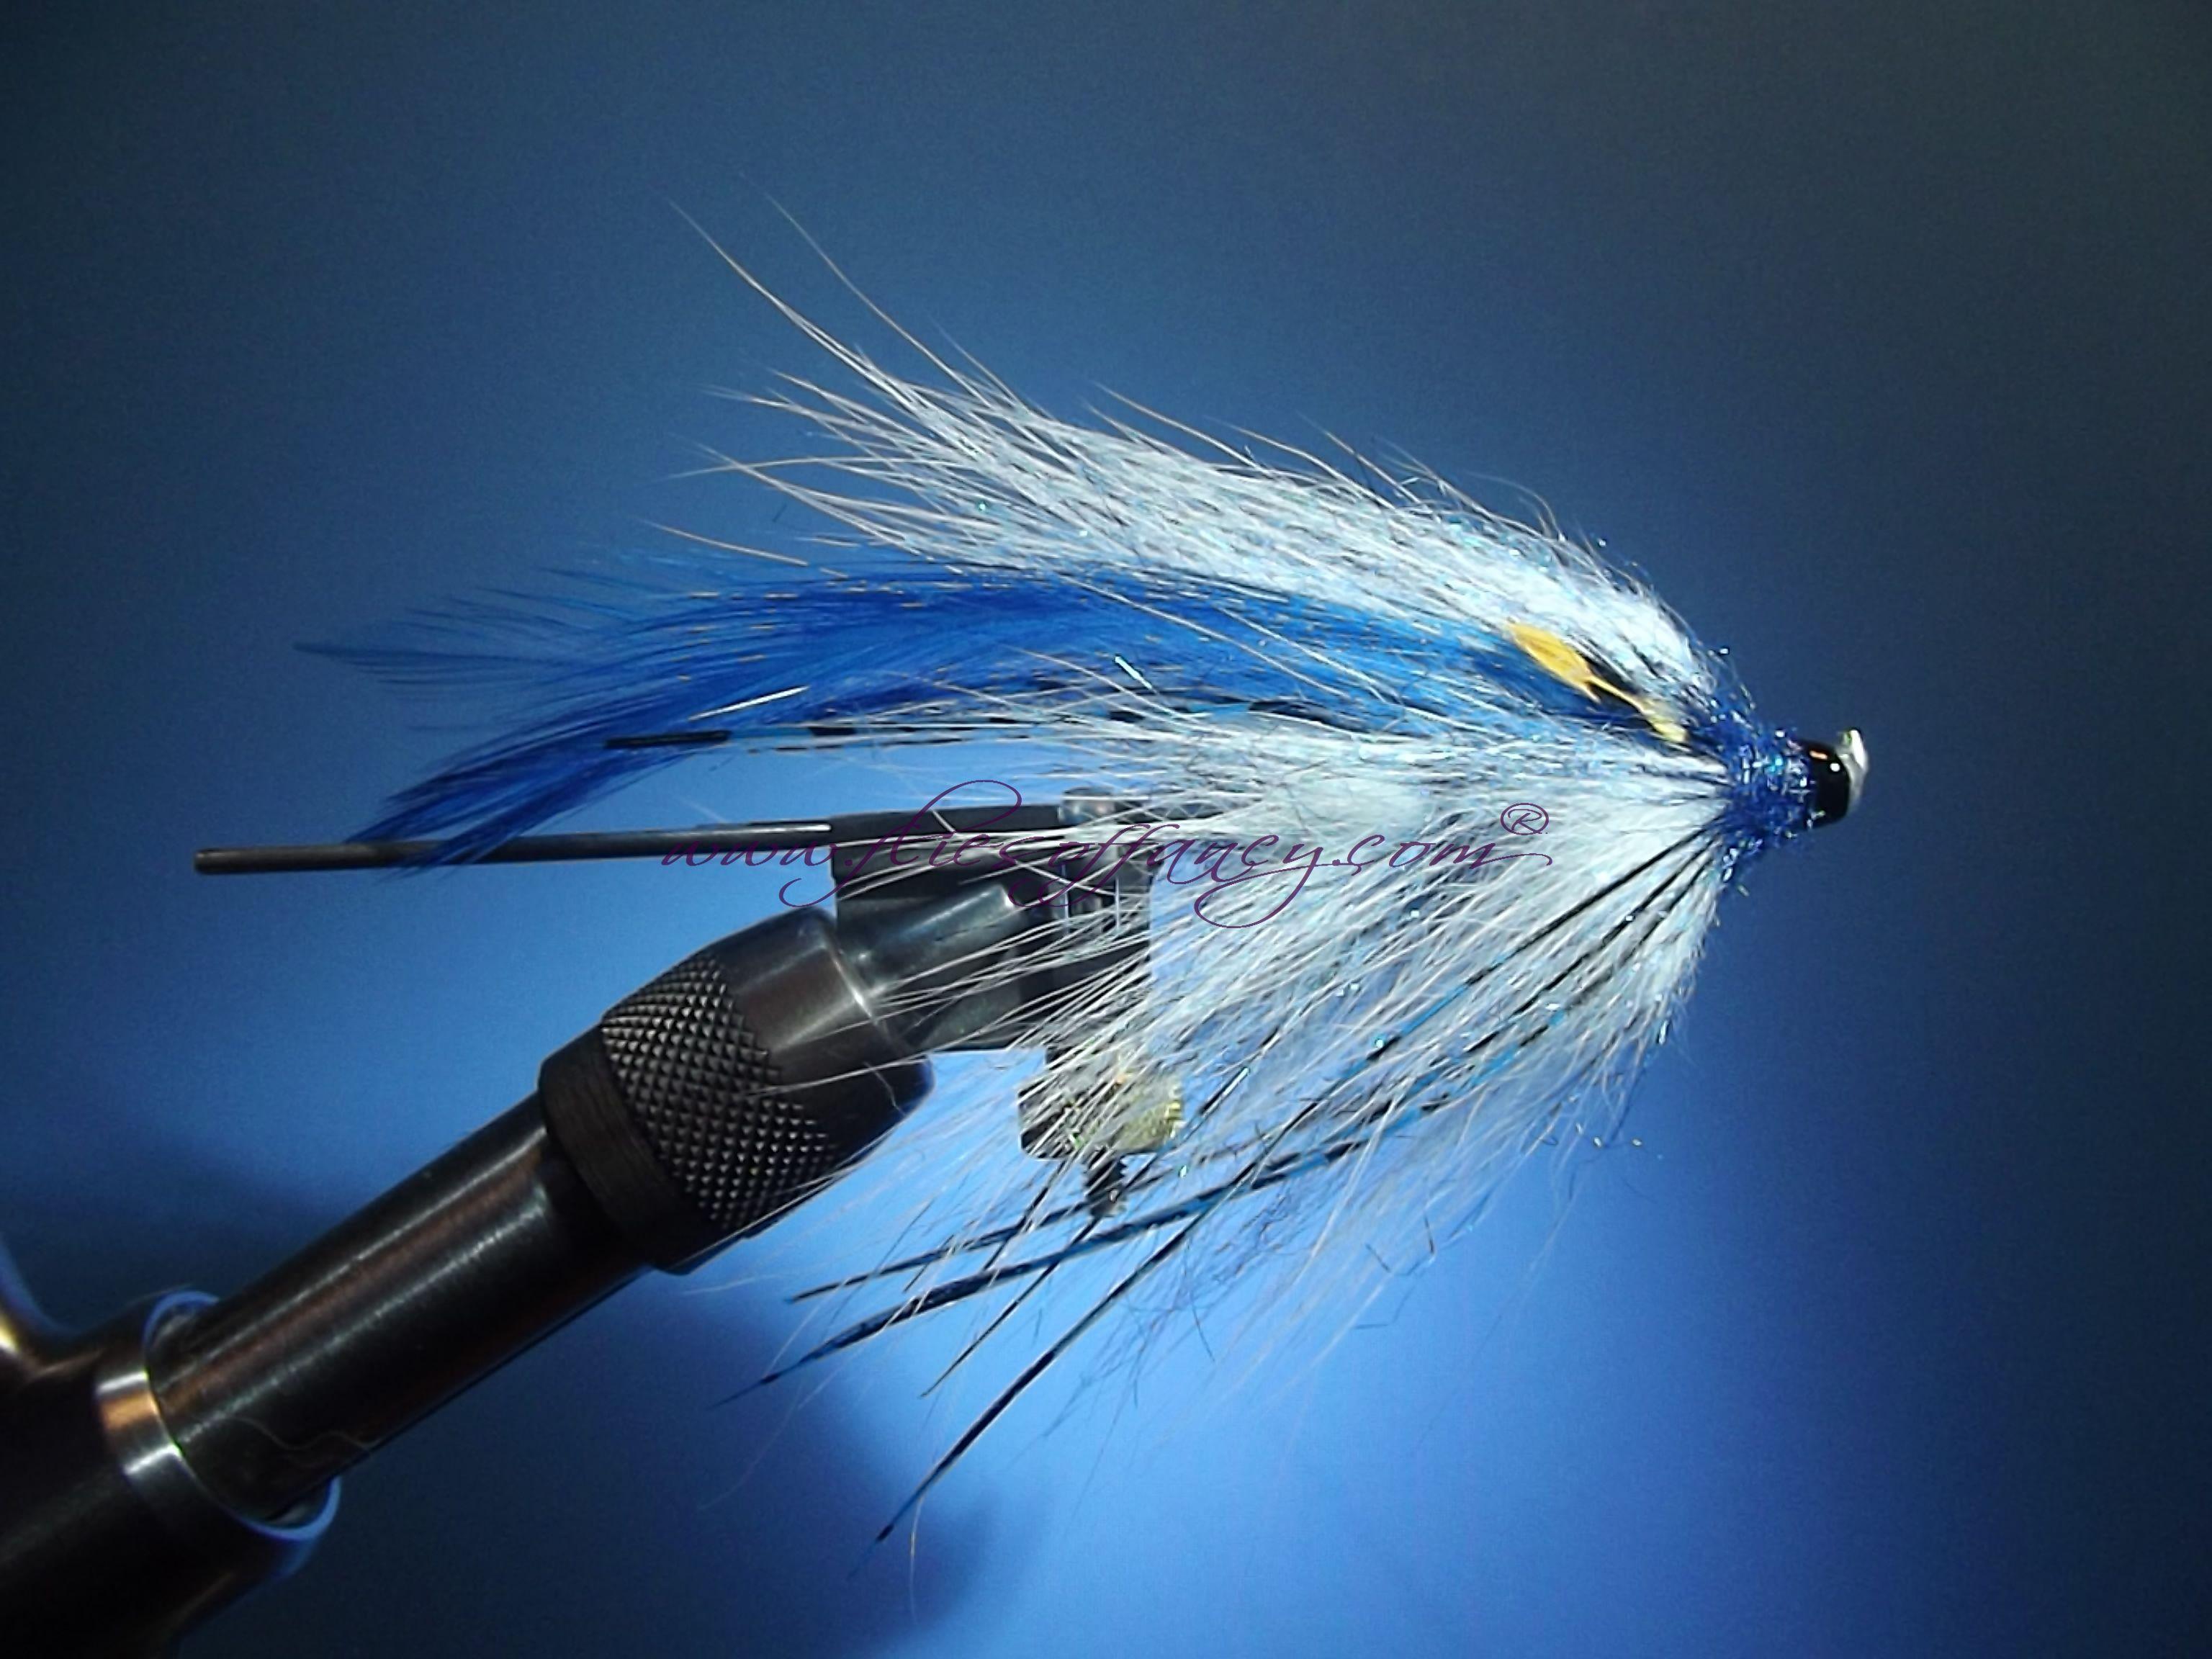 fly fishing flies - HD3072×2304